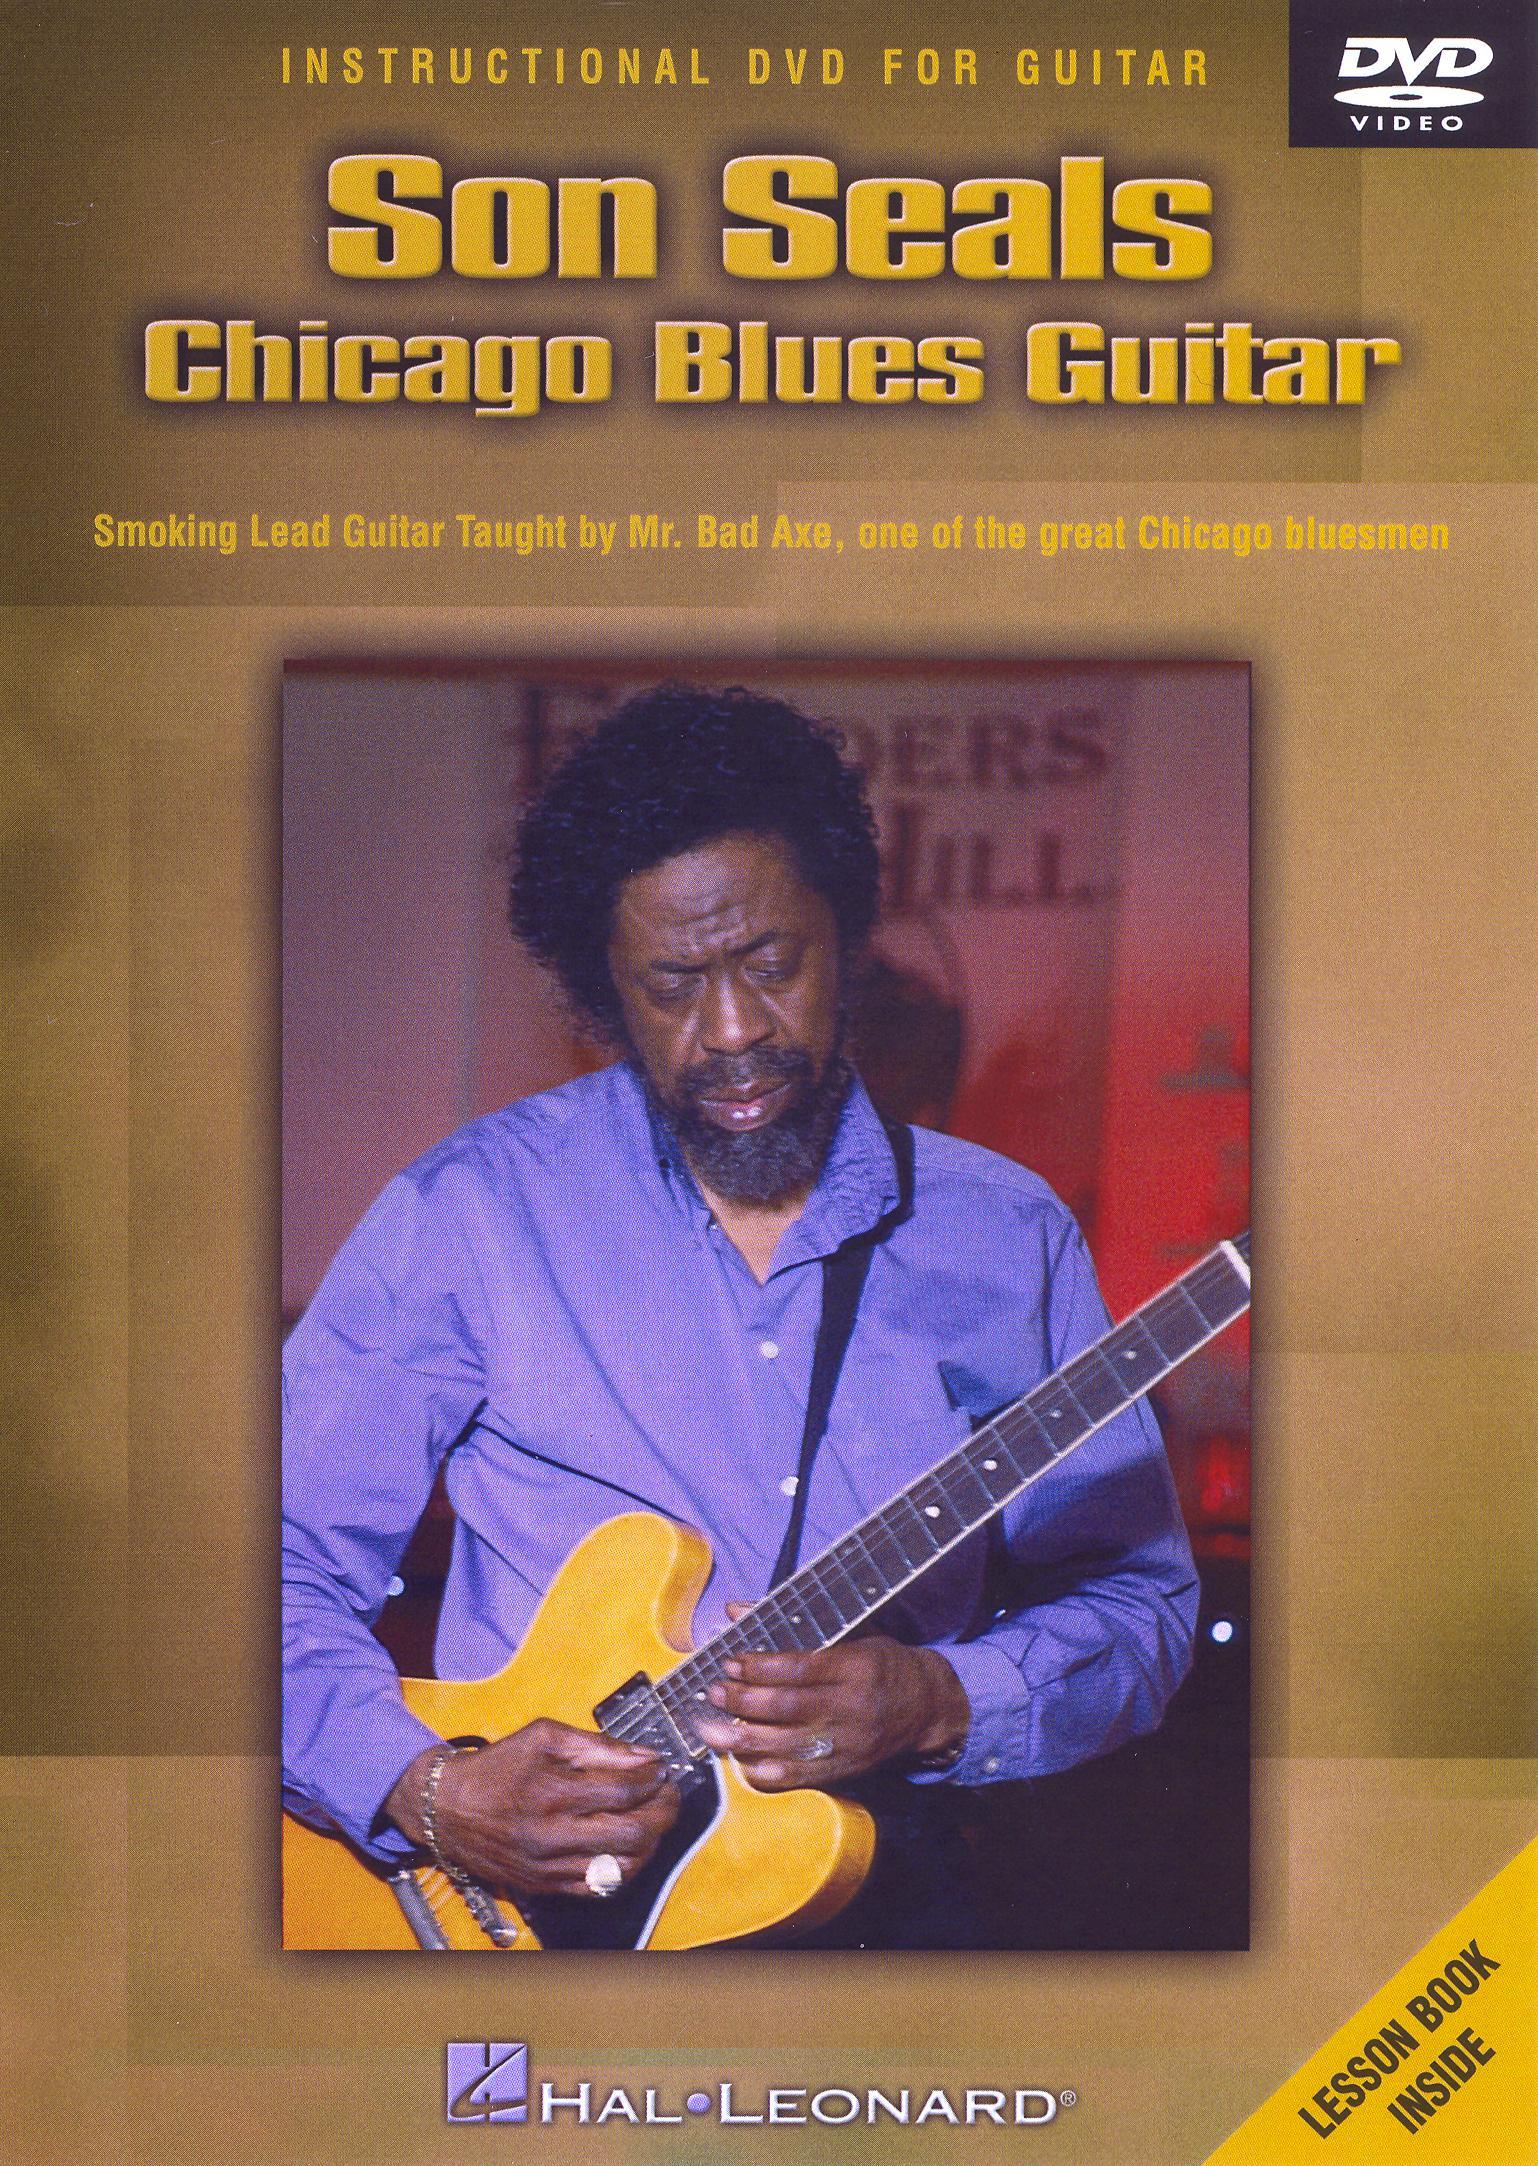 Son Seals: Chicago Blues Guitar